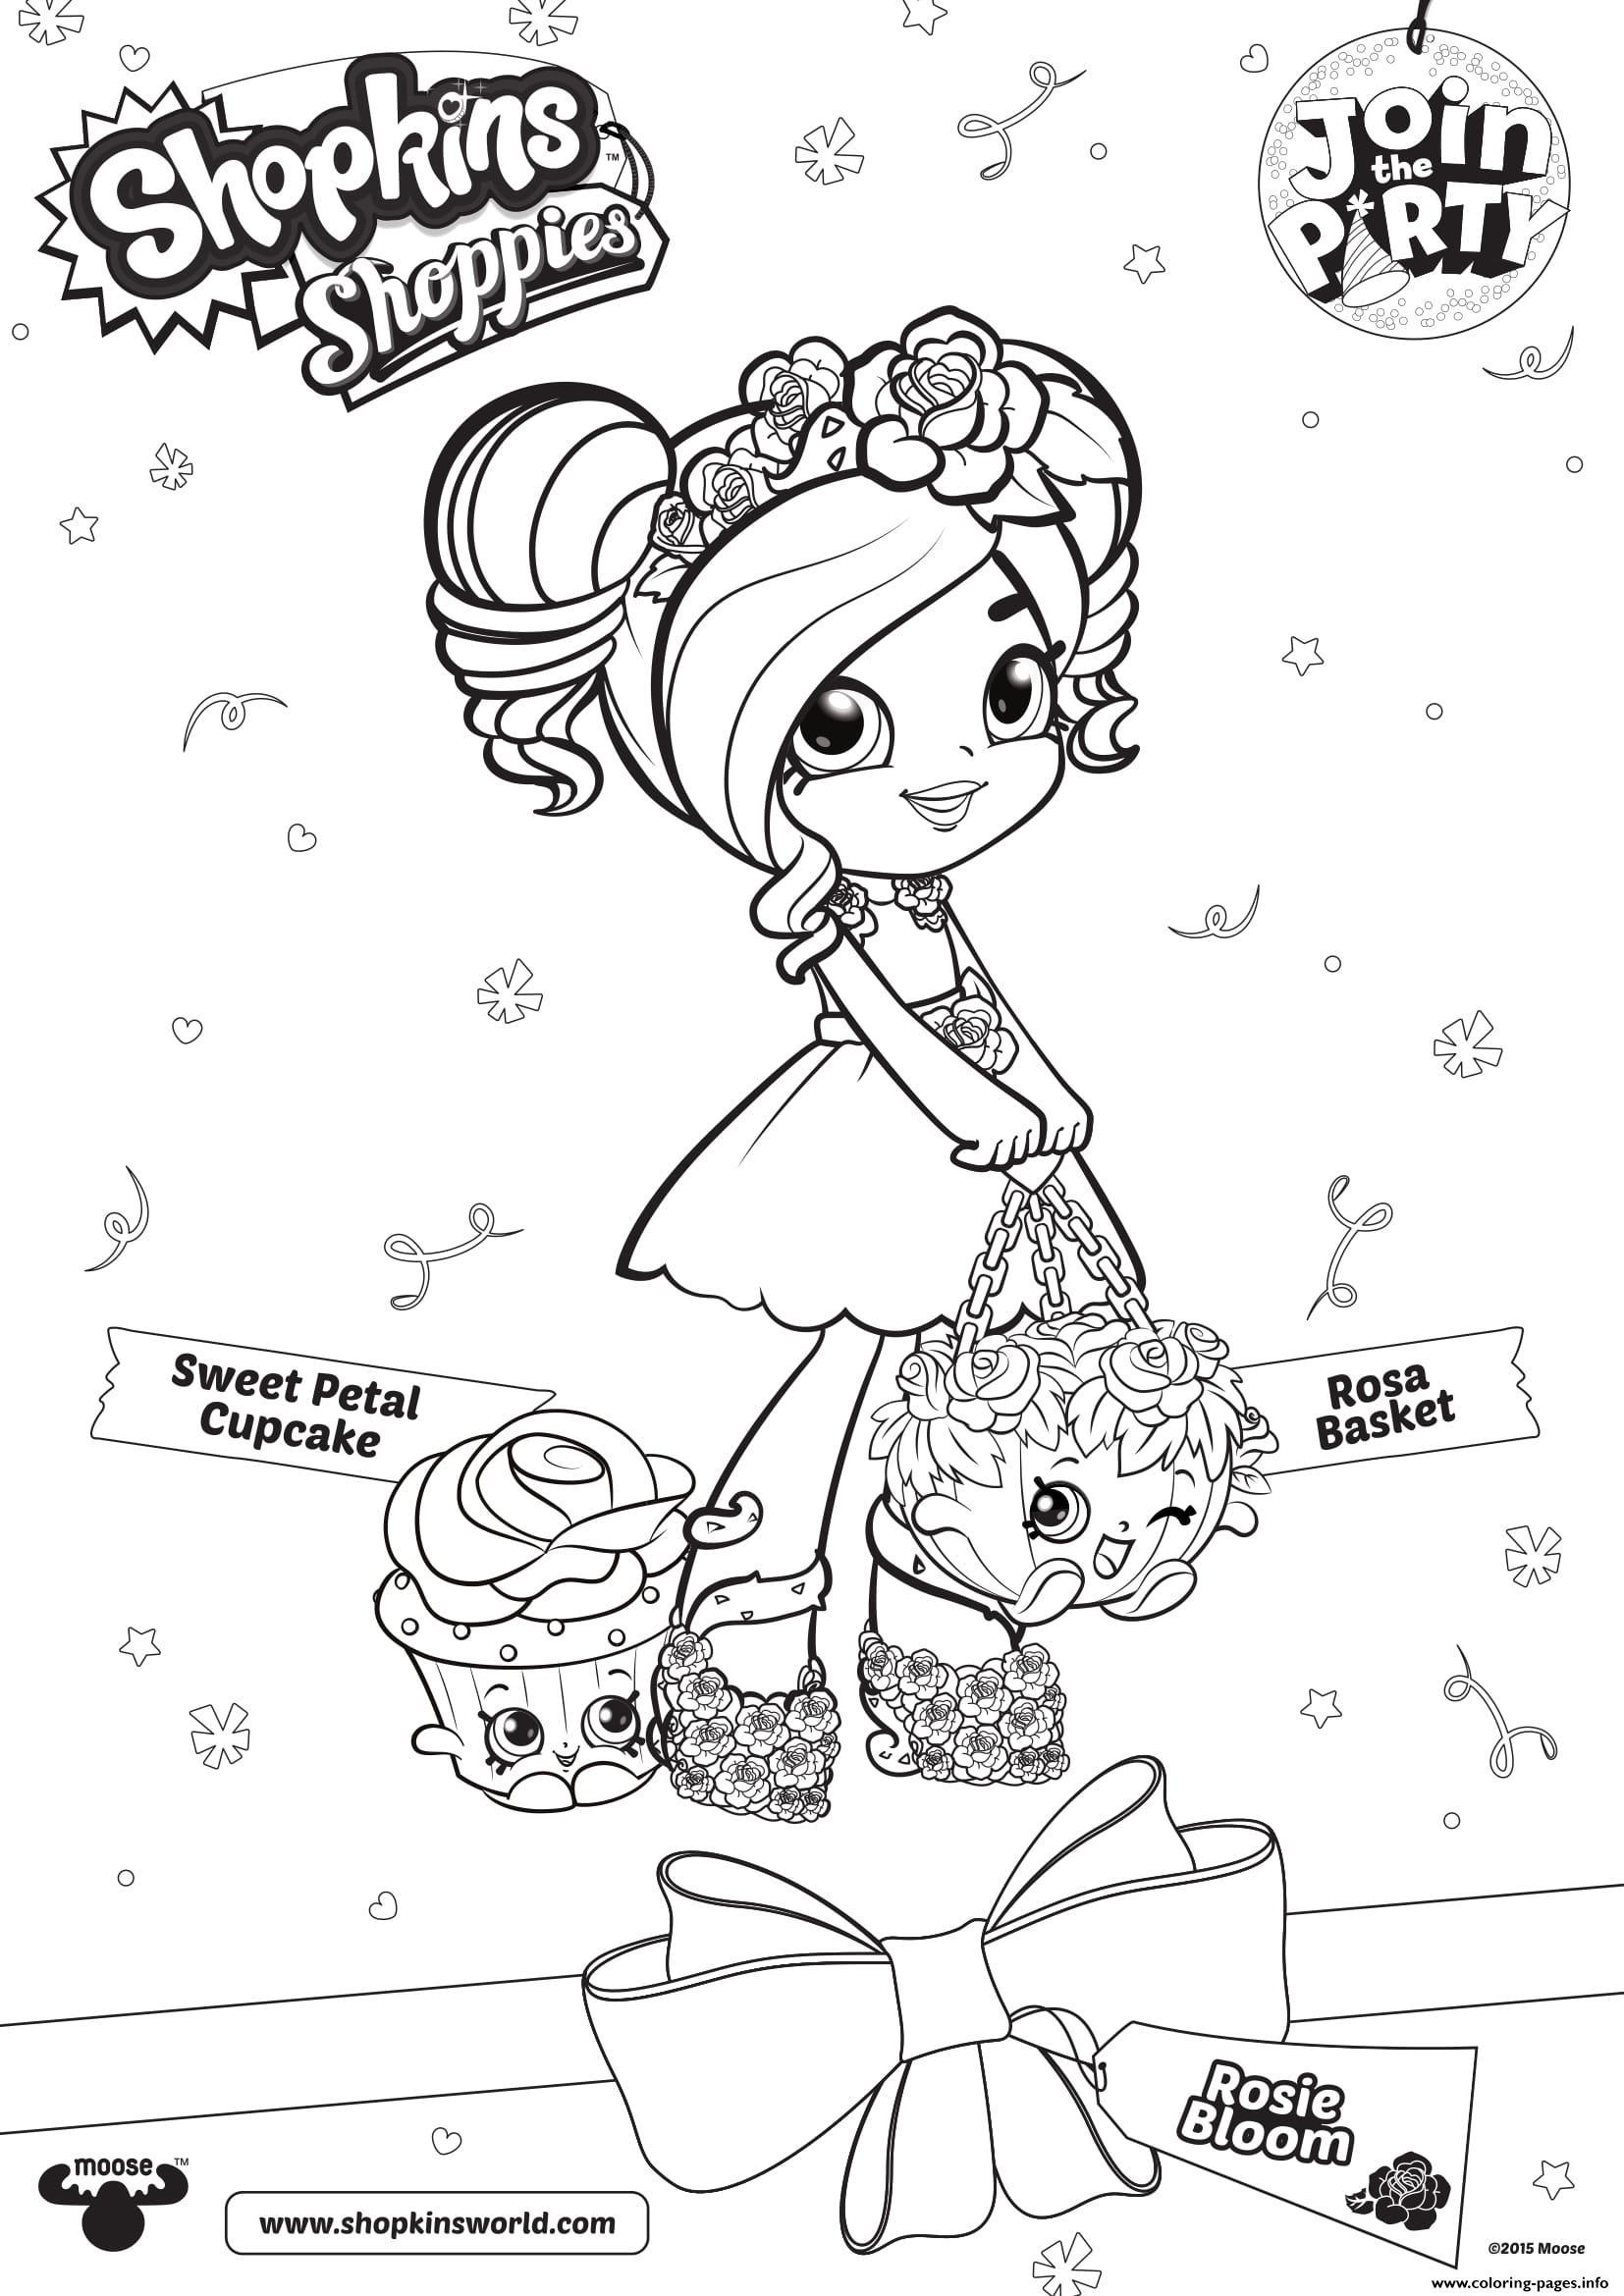 Shopkins Shoppies Sweet Petal Cupcake Rosie Bloom 1 concernant Coloriage Cupcake A Imprimer